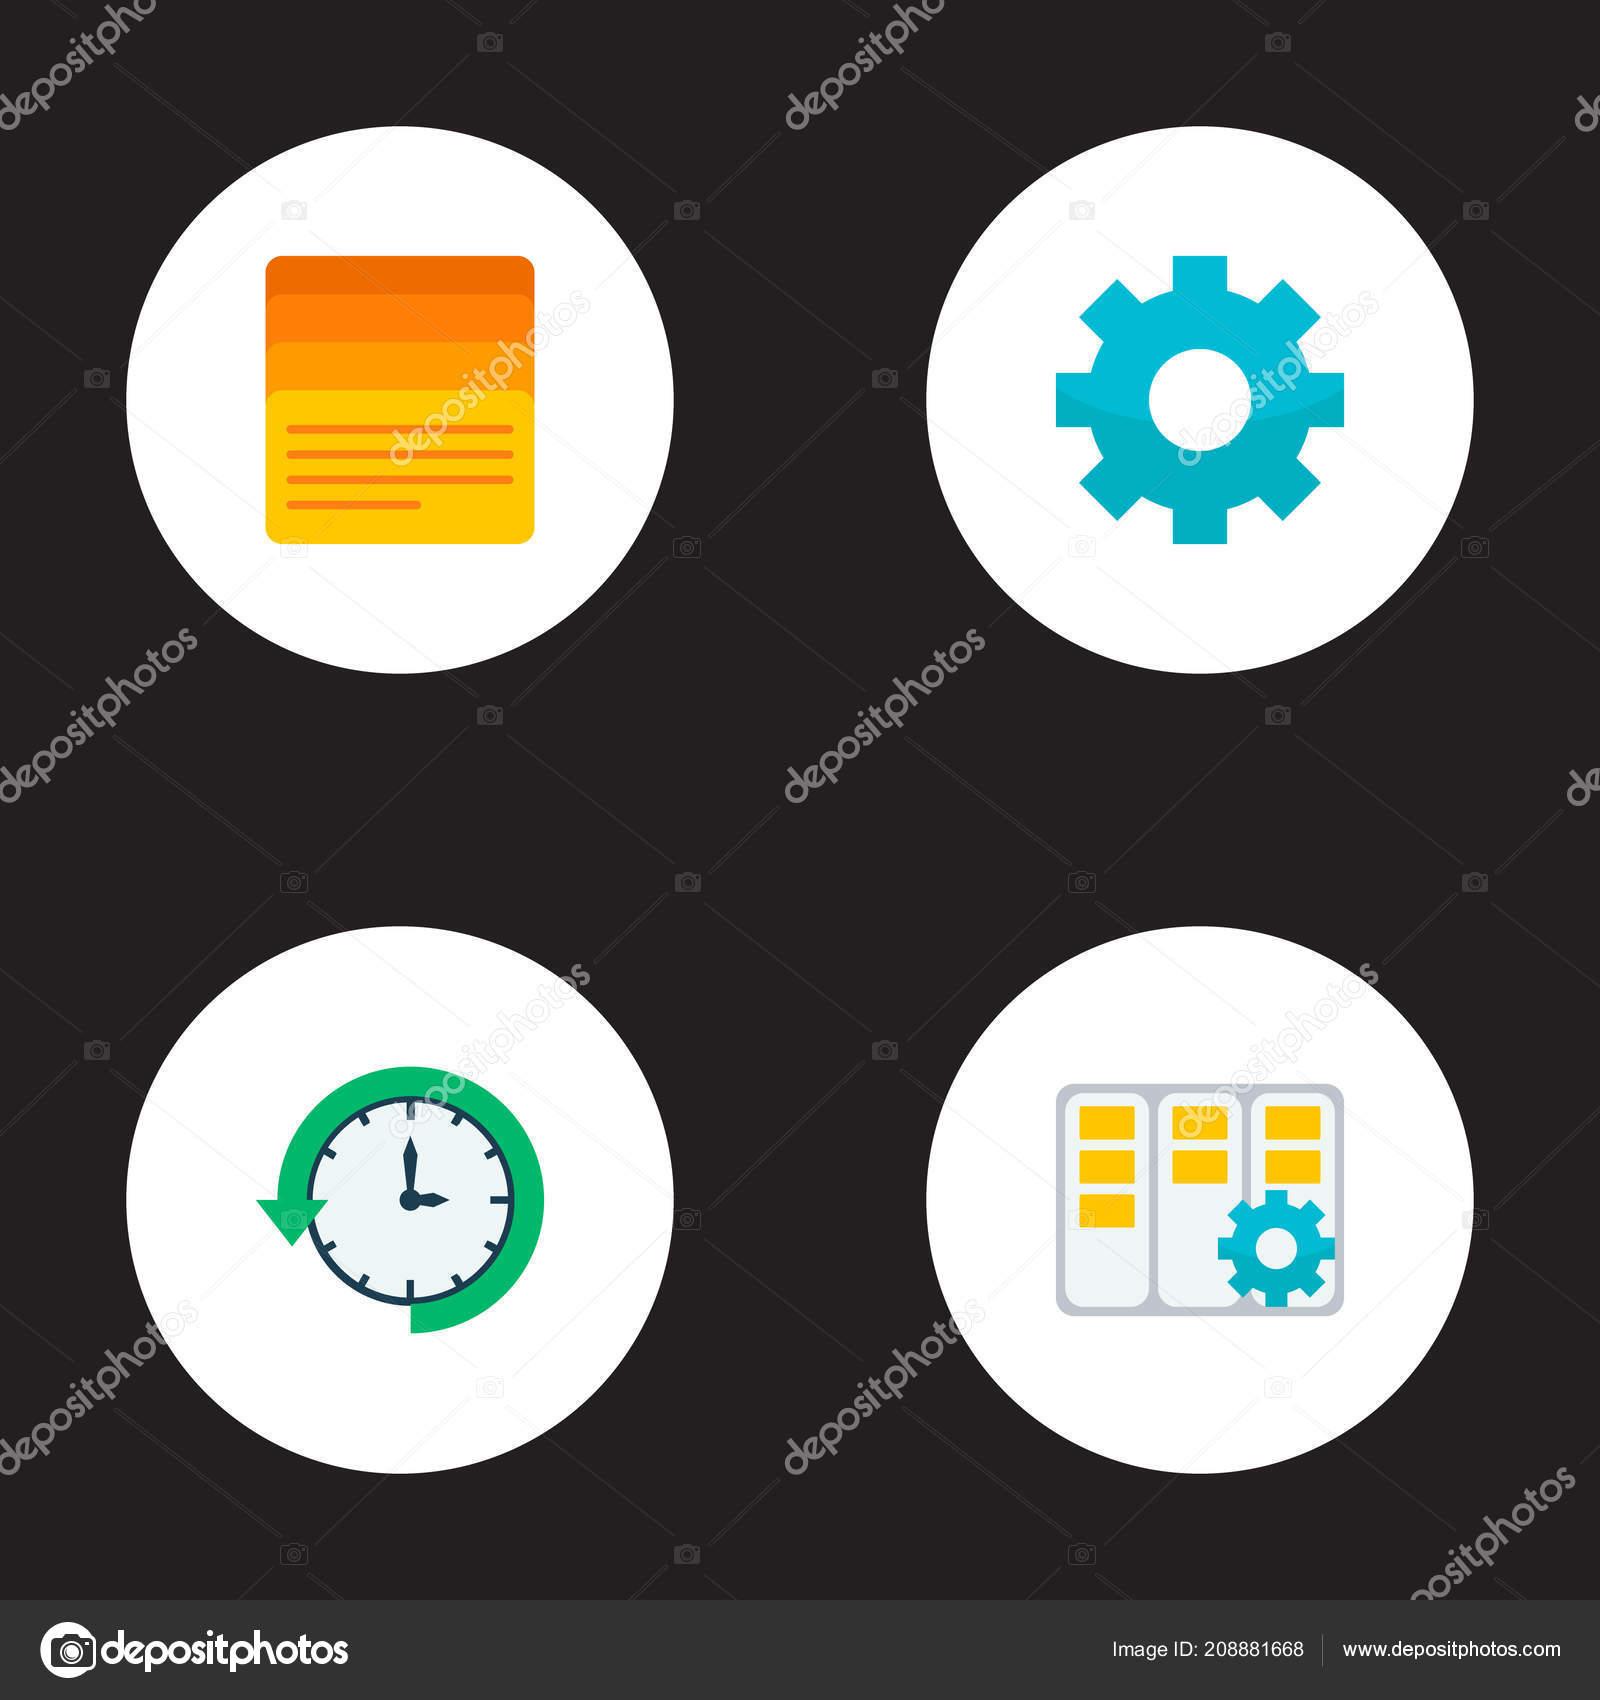 Set Of Management Icons Flat Style Symbols With Task Manager Log